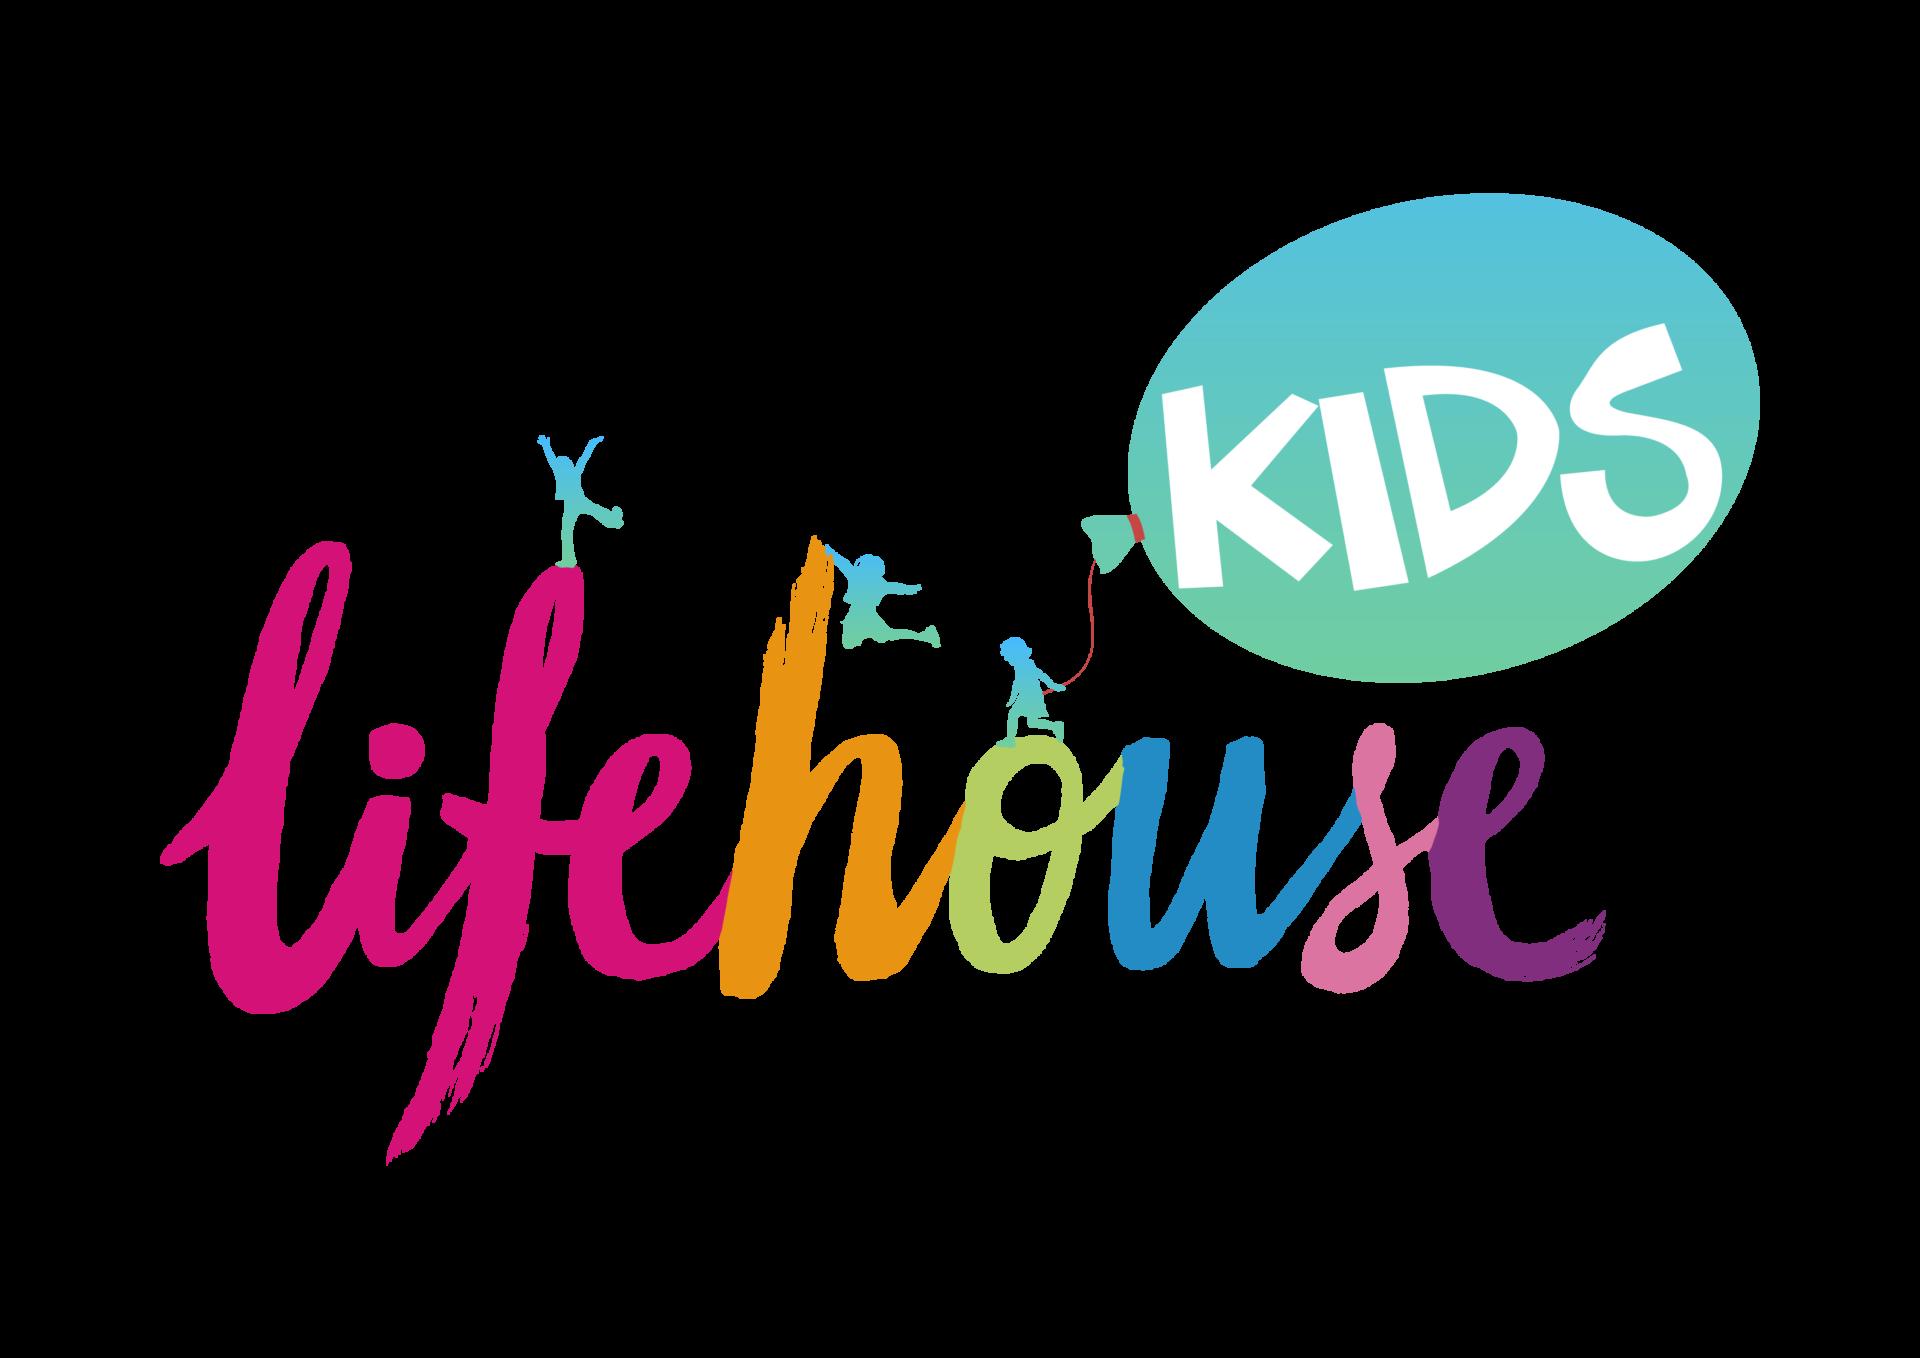 Lifehouse Kids, international kids program in Tachikawa, West Tokyo